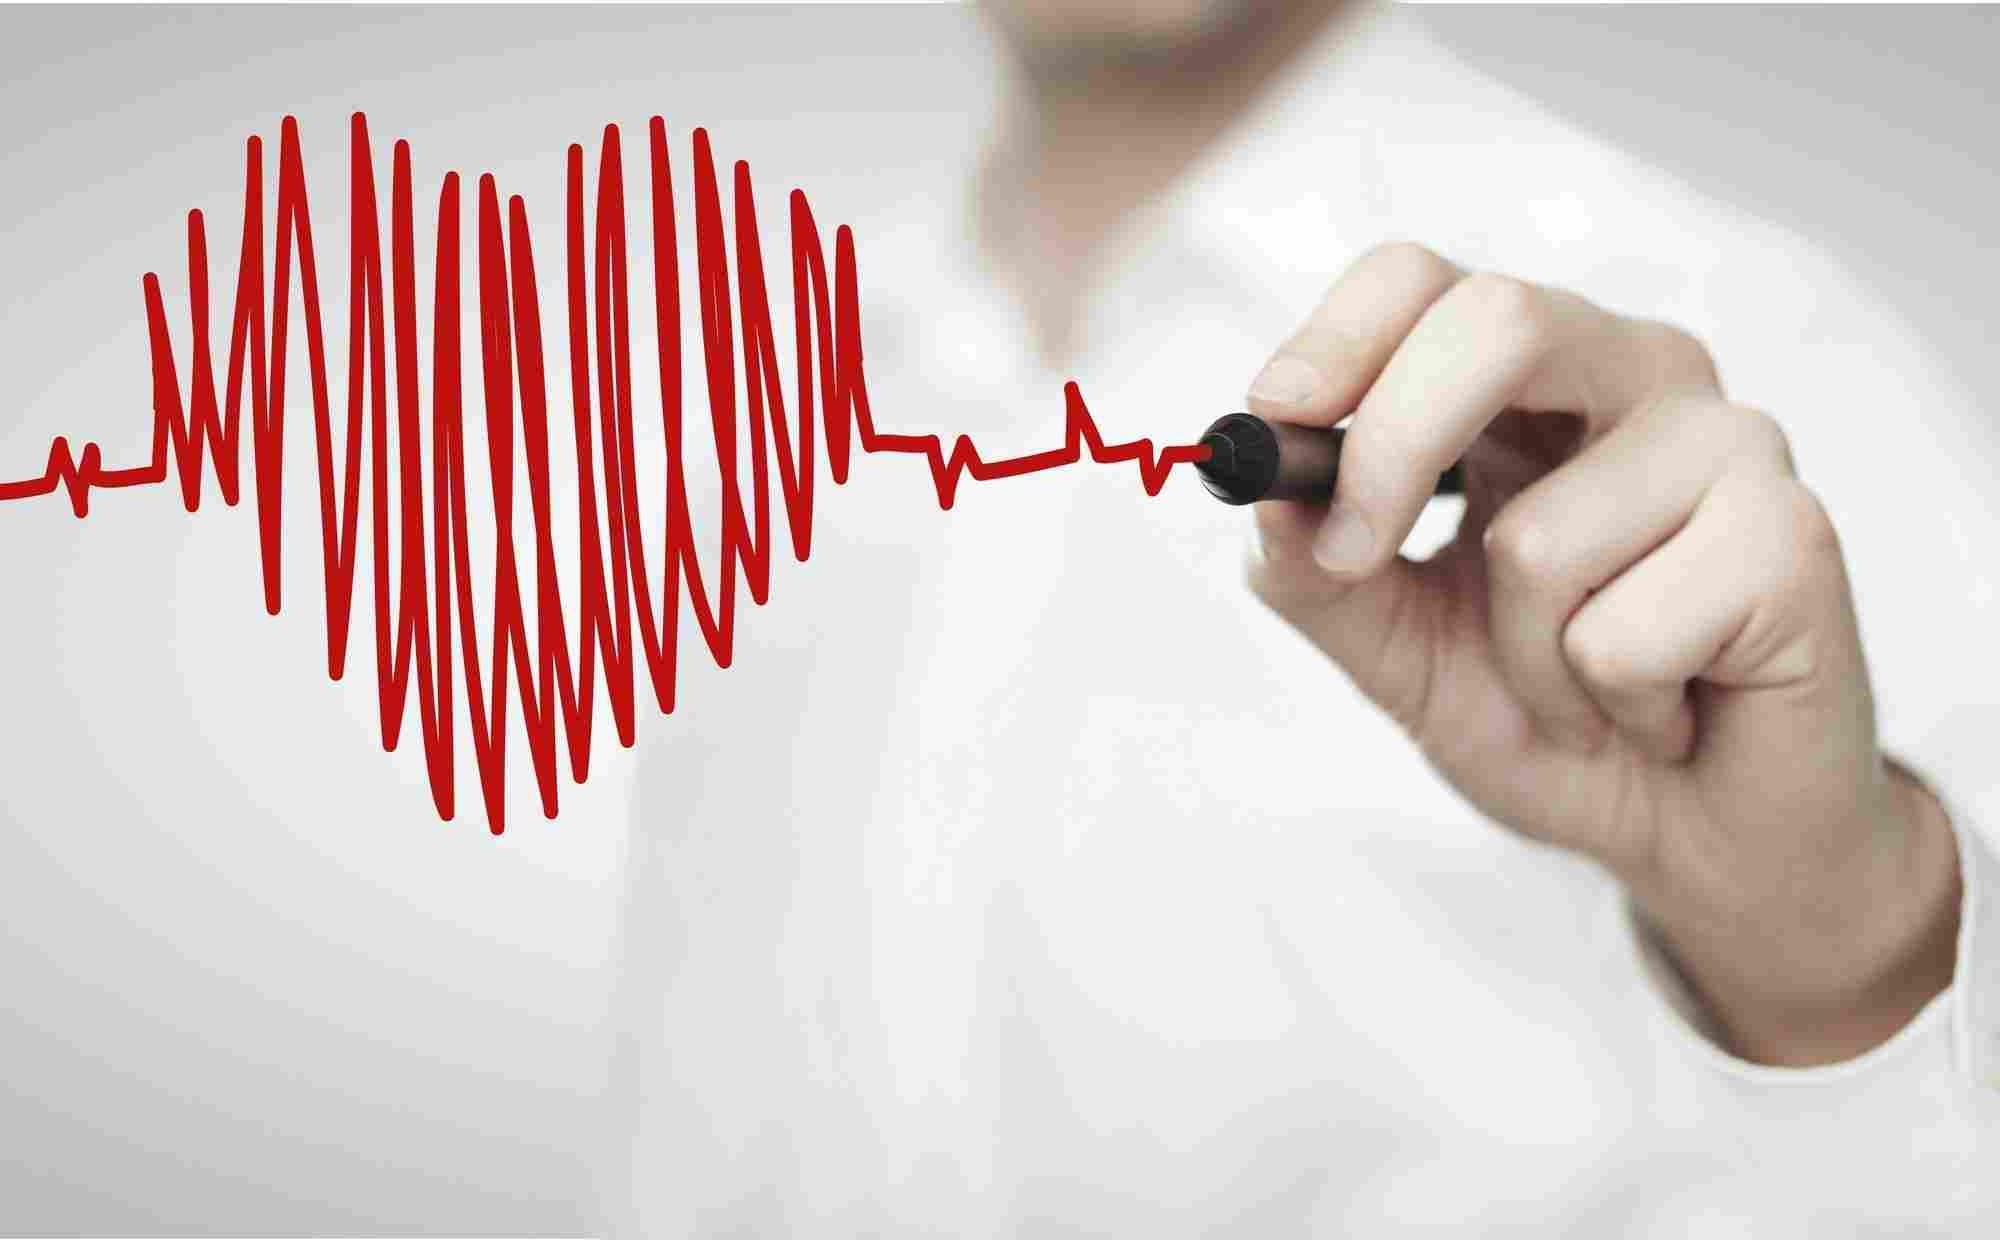 http://www.plasticka-chirurgie-dvorak.cz/wp-content/uploads/2015/12/heart-health-1.jpg